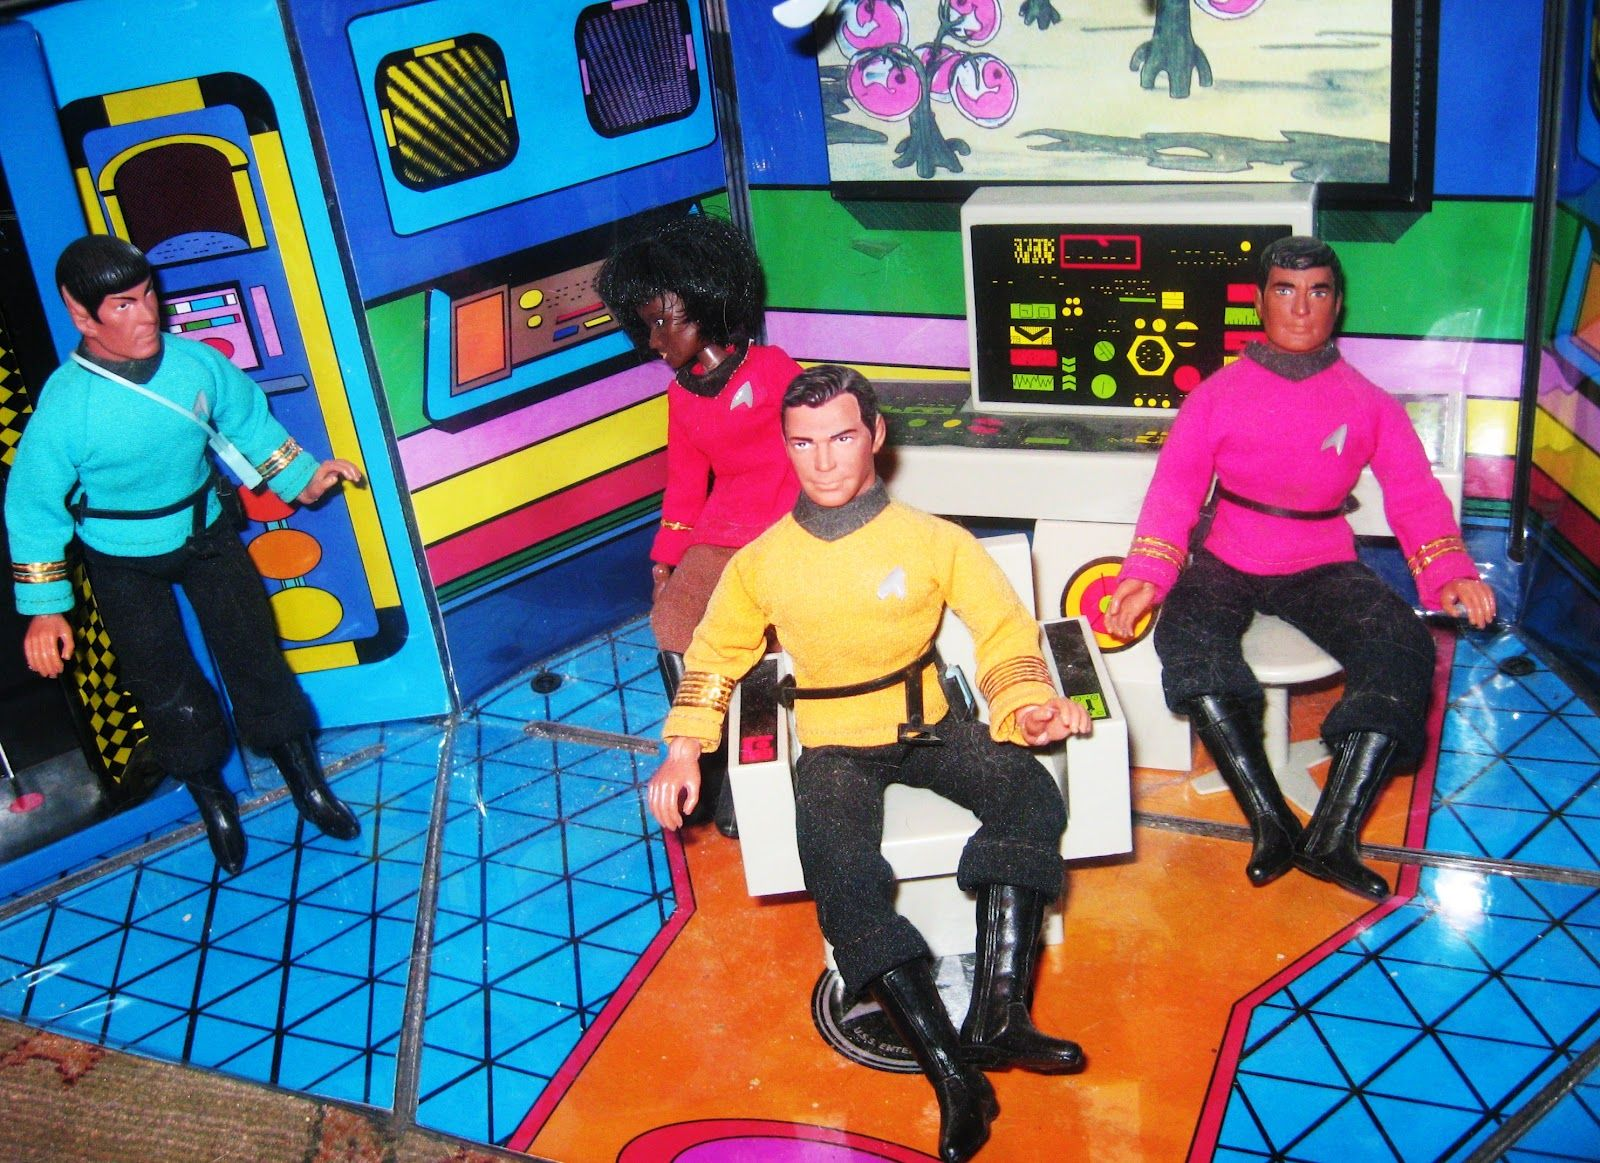 Ship captain crew bettingadvice spread betting tax rules hmrc jobs